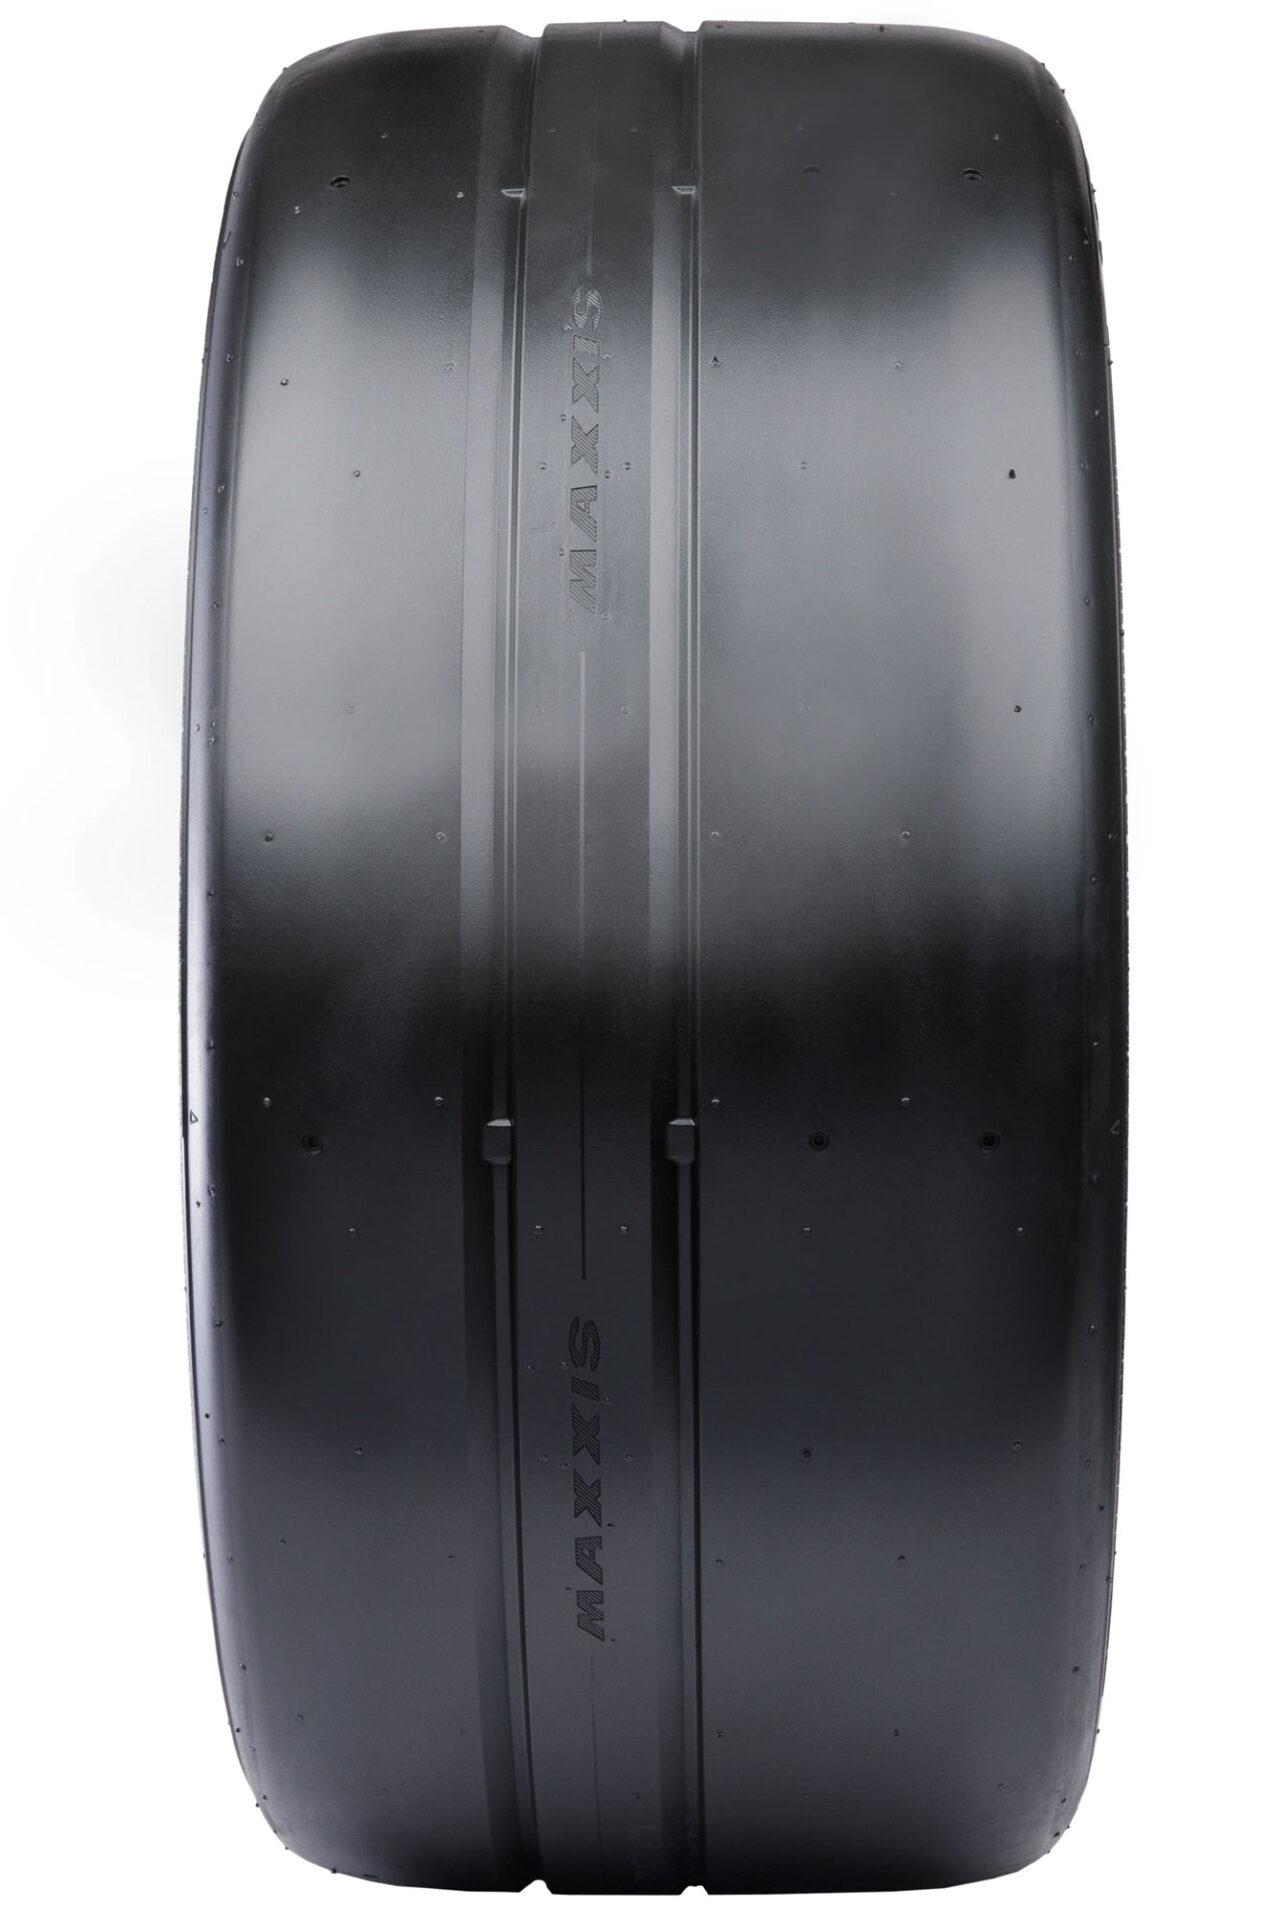 Maxxis Victra RC-1 tire tread